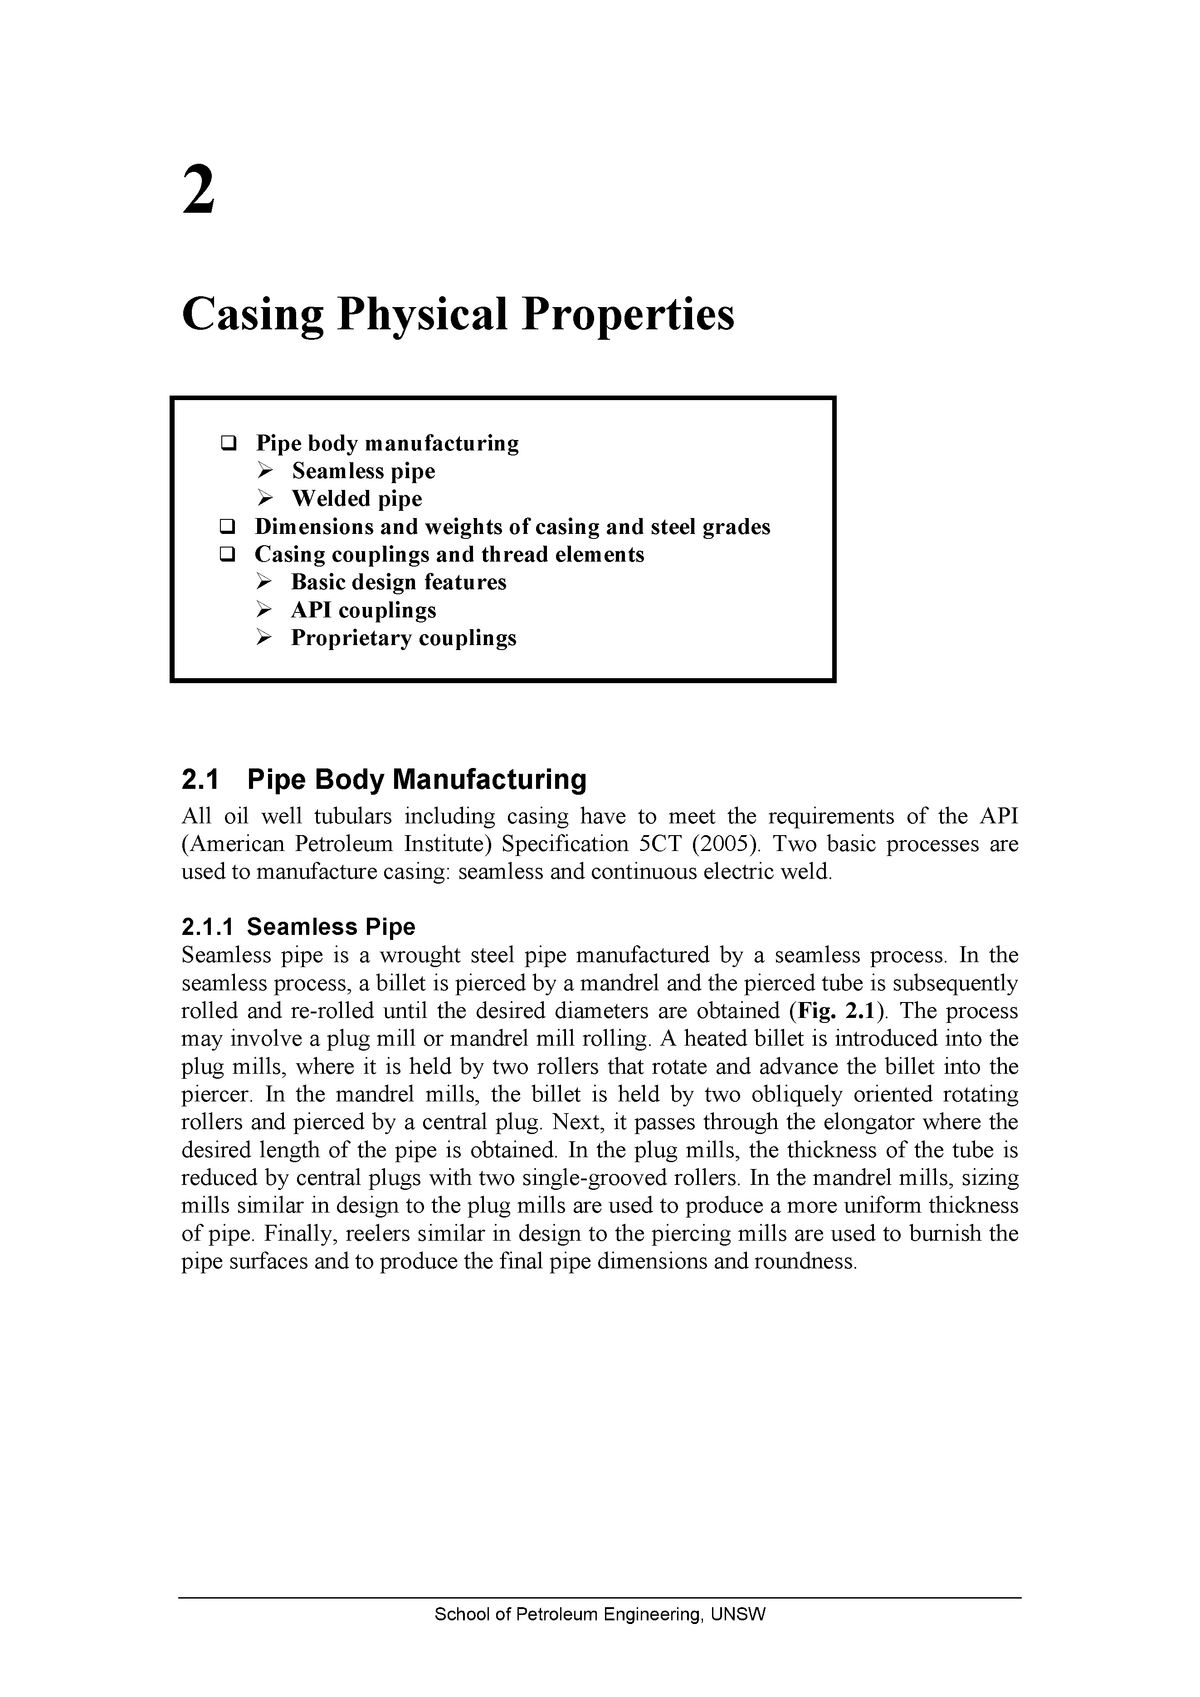 Ch2-Casing Physical Properties - Ptrl 4017 - UNSW - StuDocu